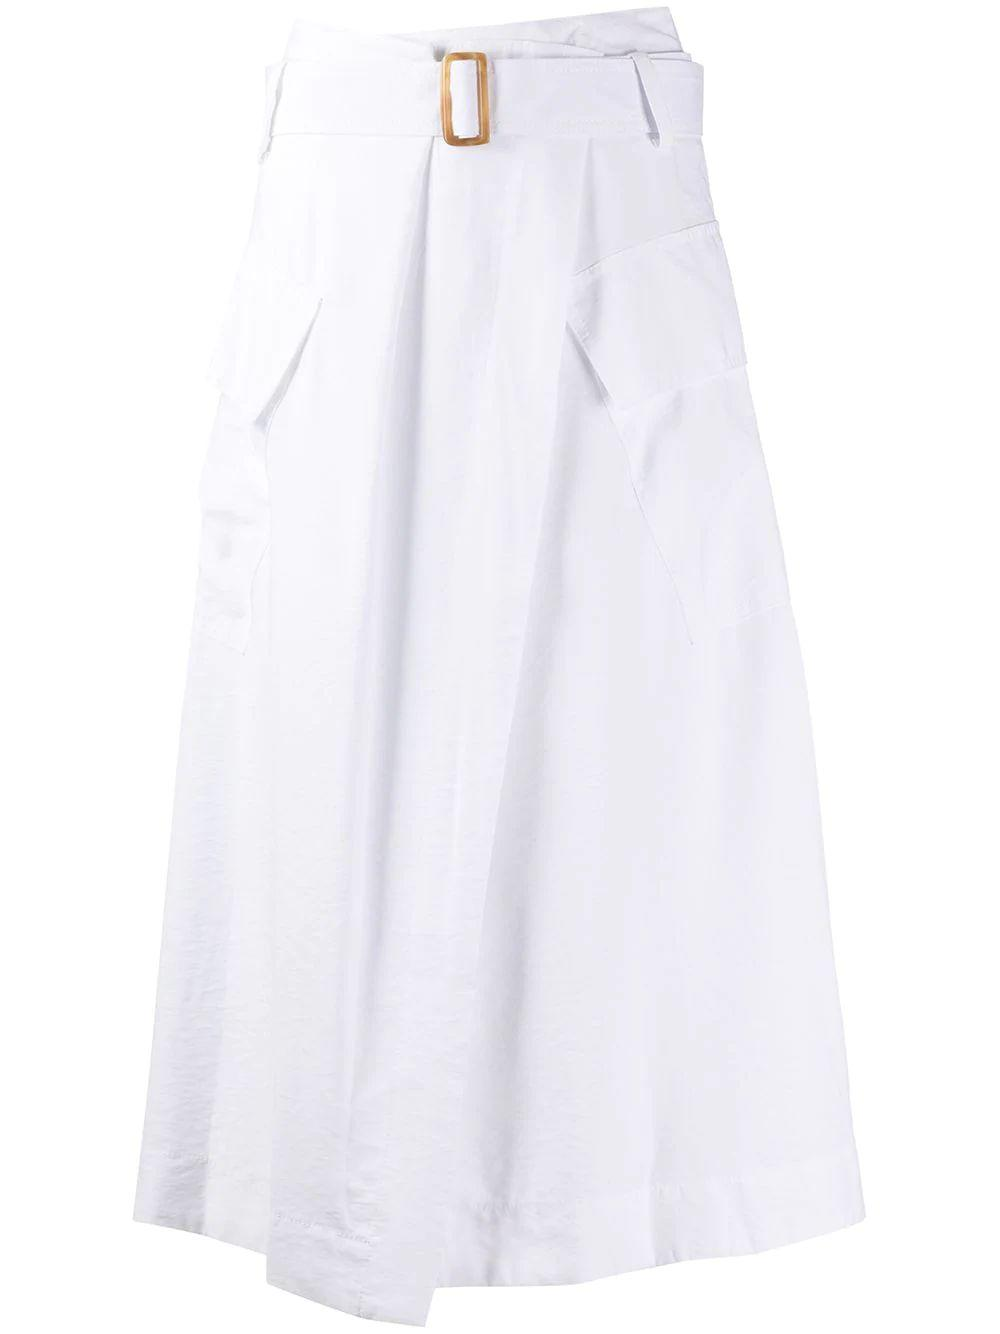 Utility Belted Midi Skirt